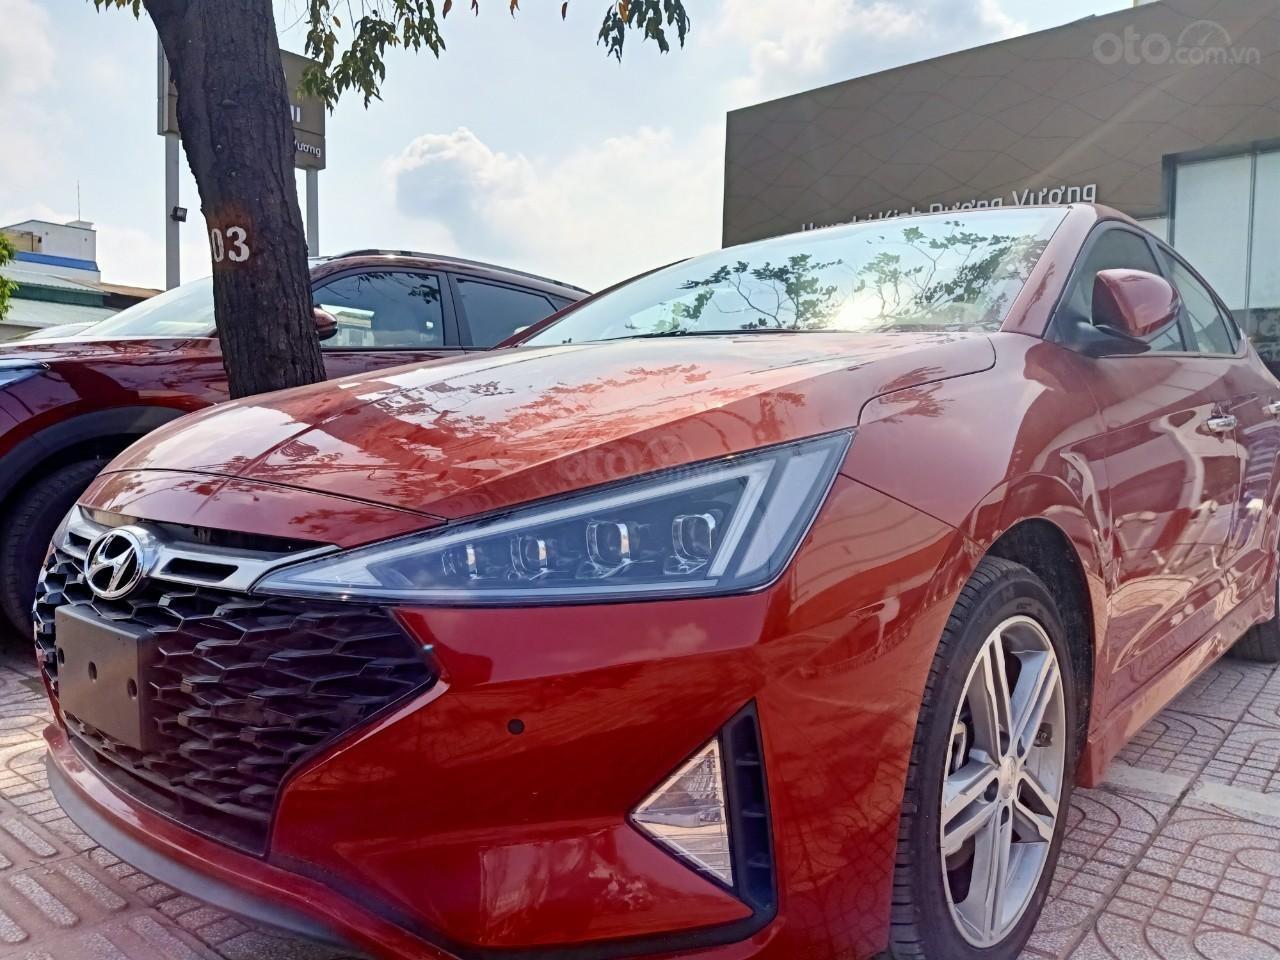 Hyundai Elantra 1.6AT Sport đỏ+ Sale sốc KM 40 triệu+ xe giao ngay (2)